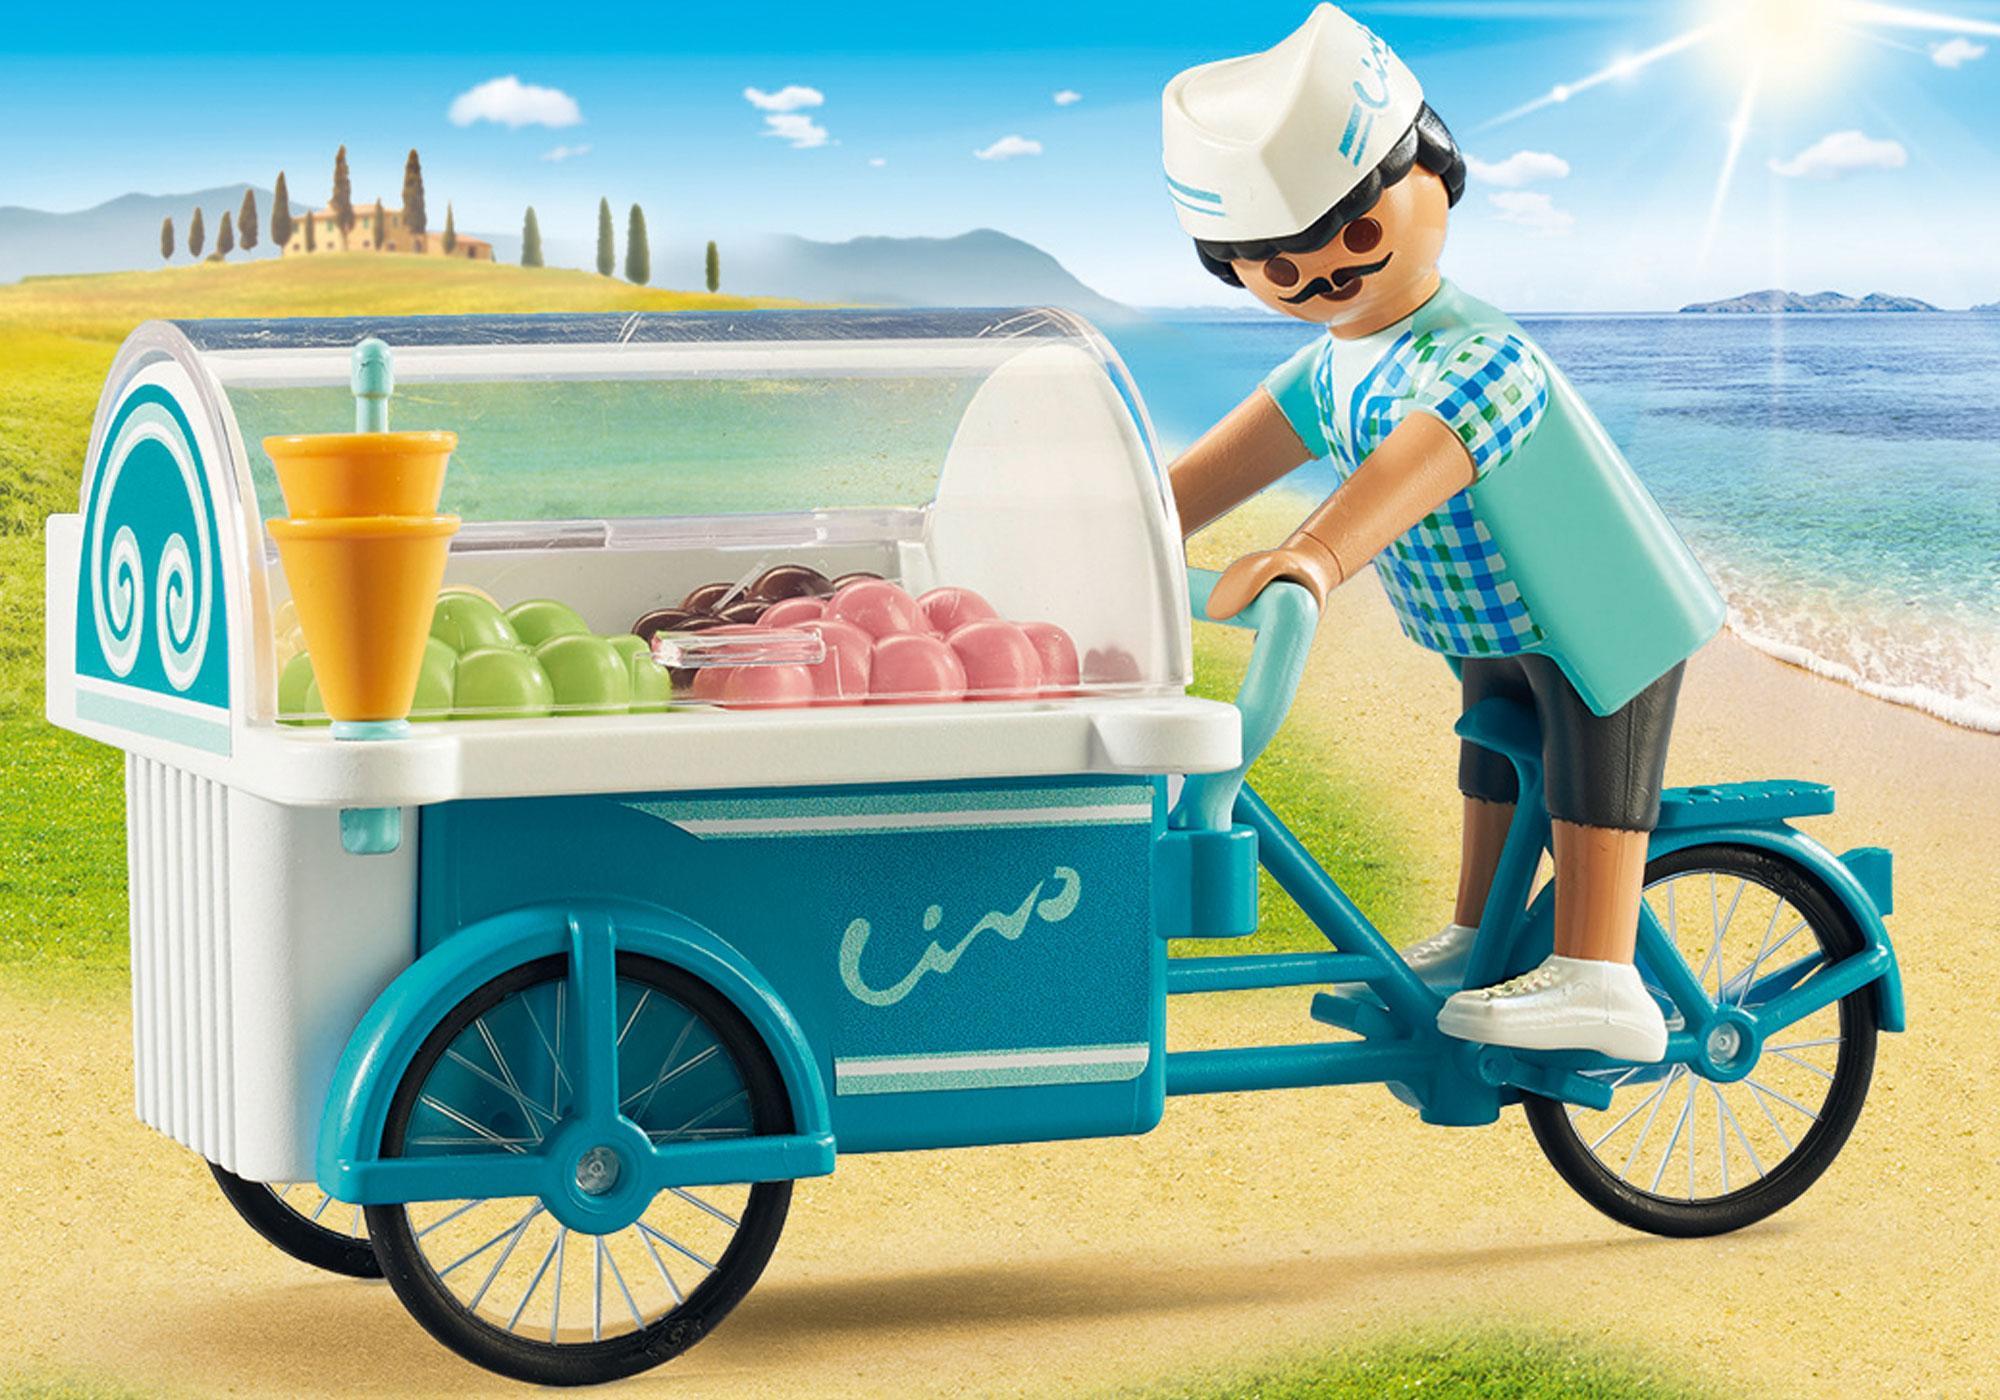 http://media.playmobil.com/i/playmobil/9426_product_extra1/Παγωτατζής με ποδήλατο ψυγείο